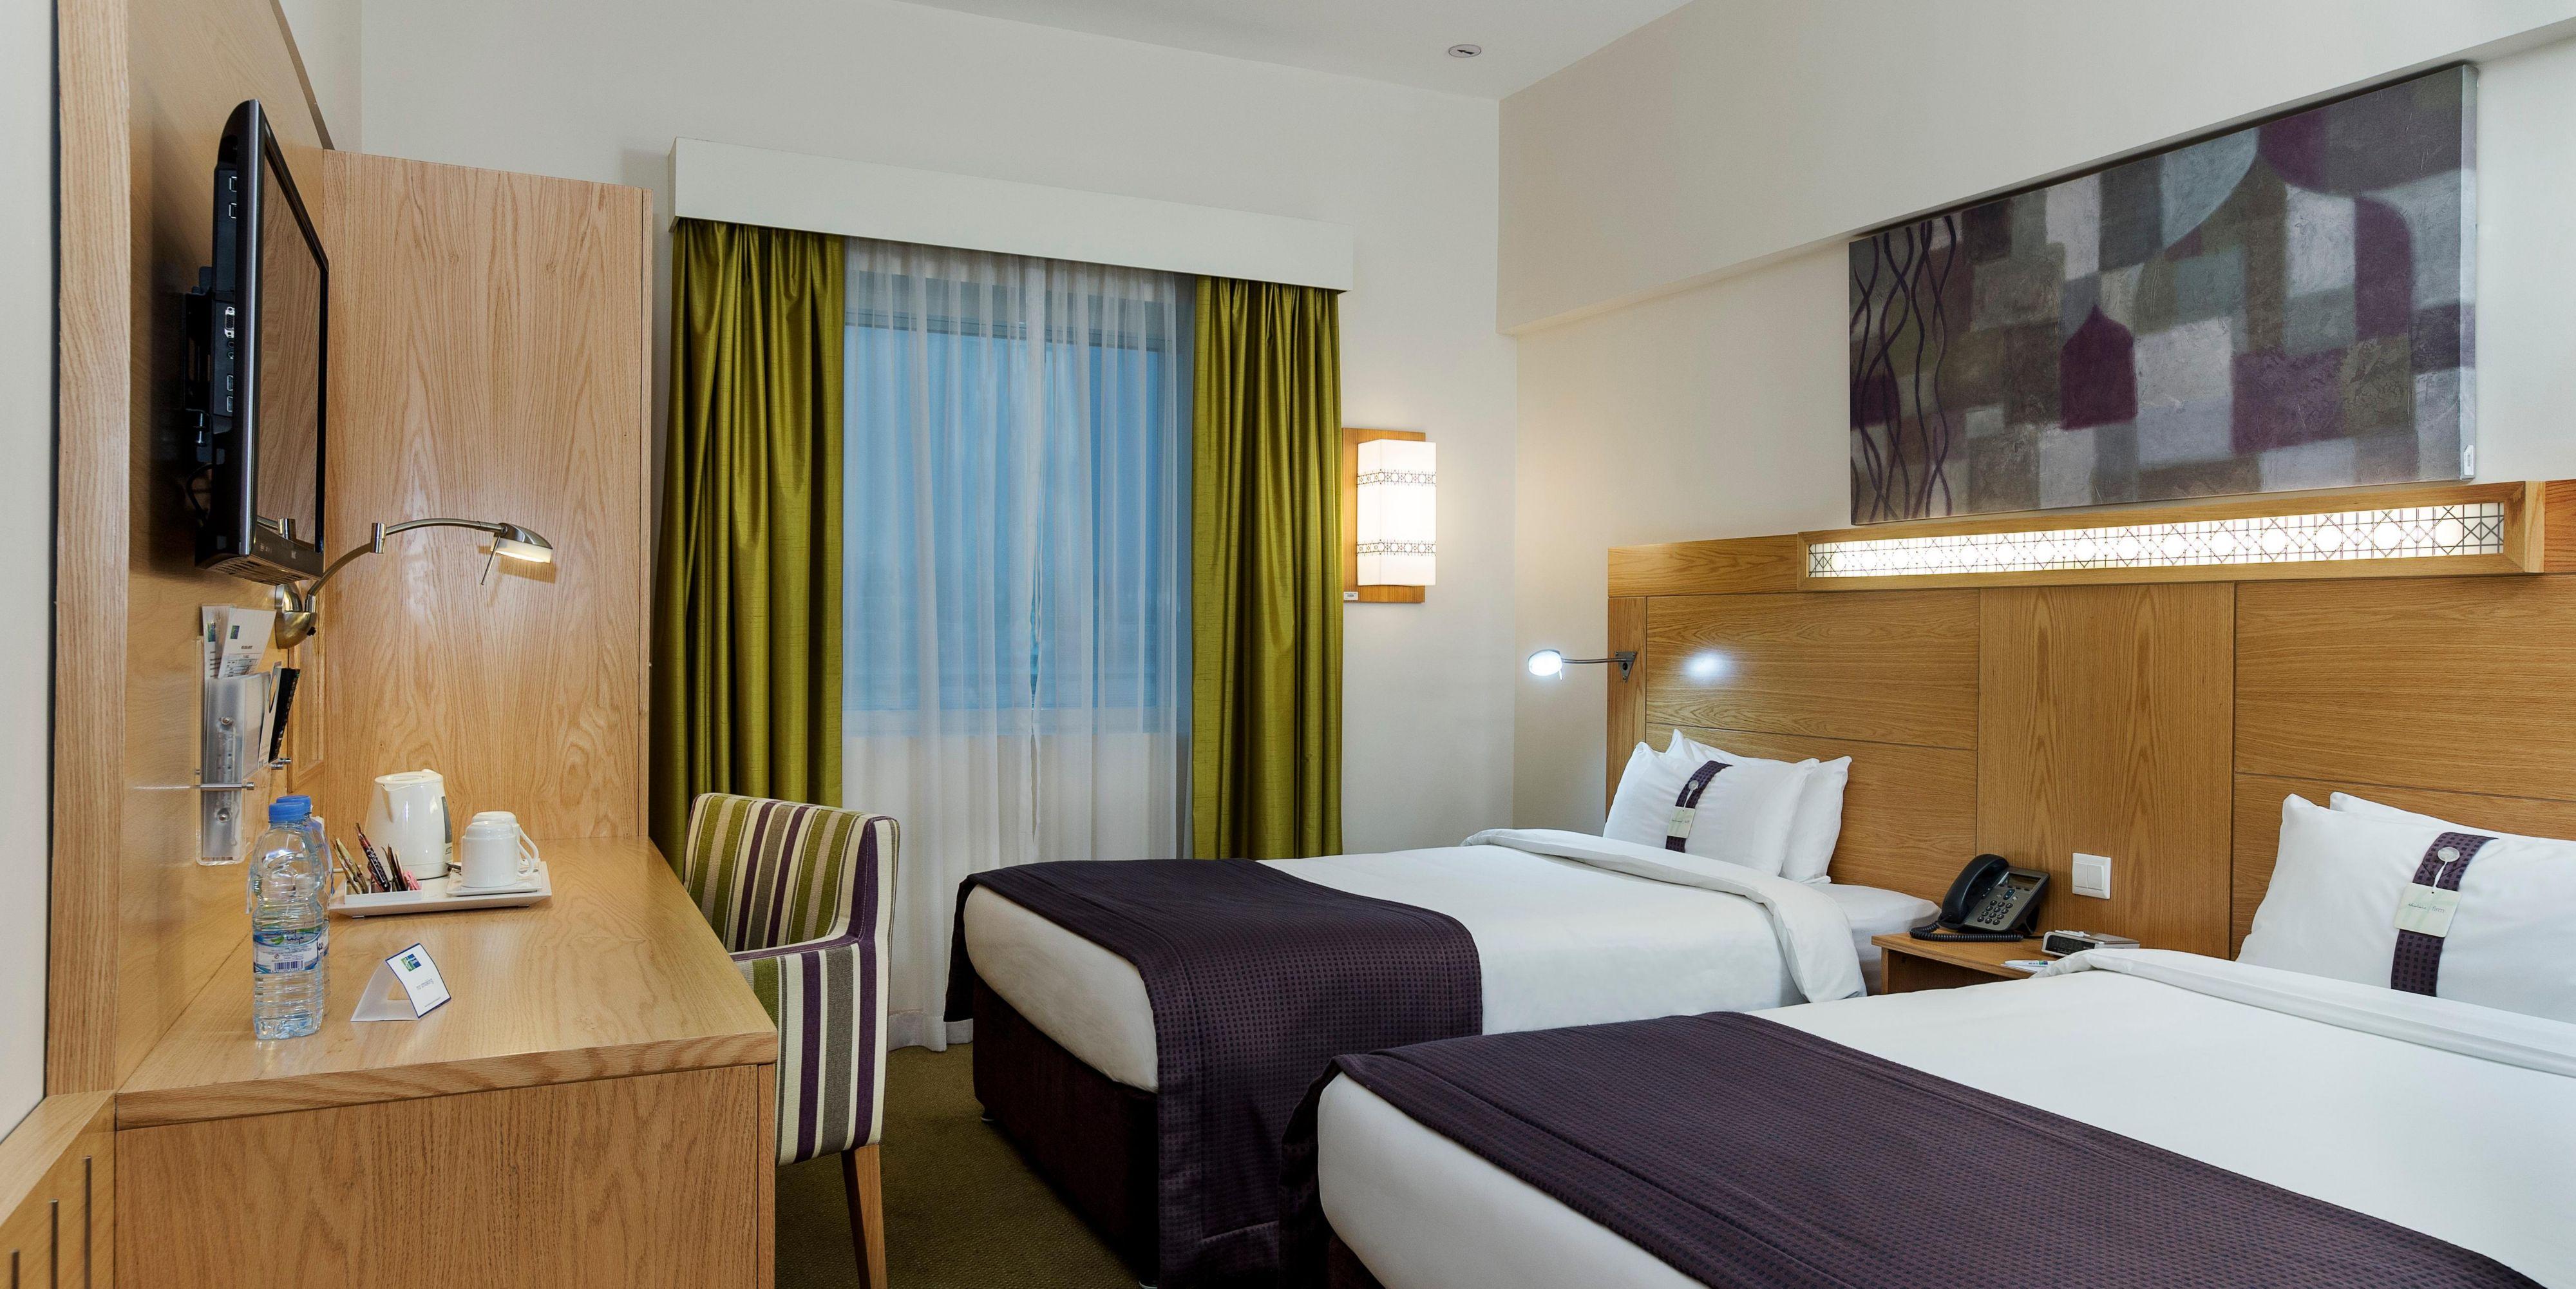 paris dubai pas cher latest hotel indigo paris opera with paris dubai pas cher top hotel. Black Bedroom Furniture Sets. Home Design Ideas